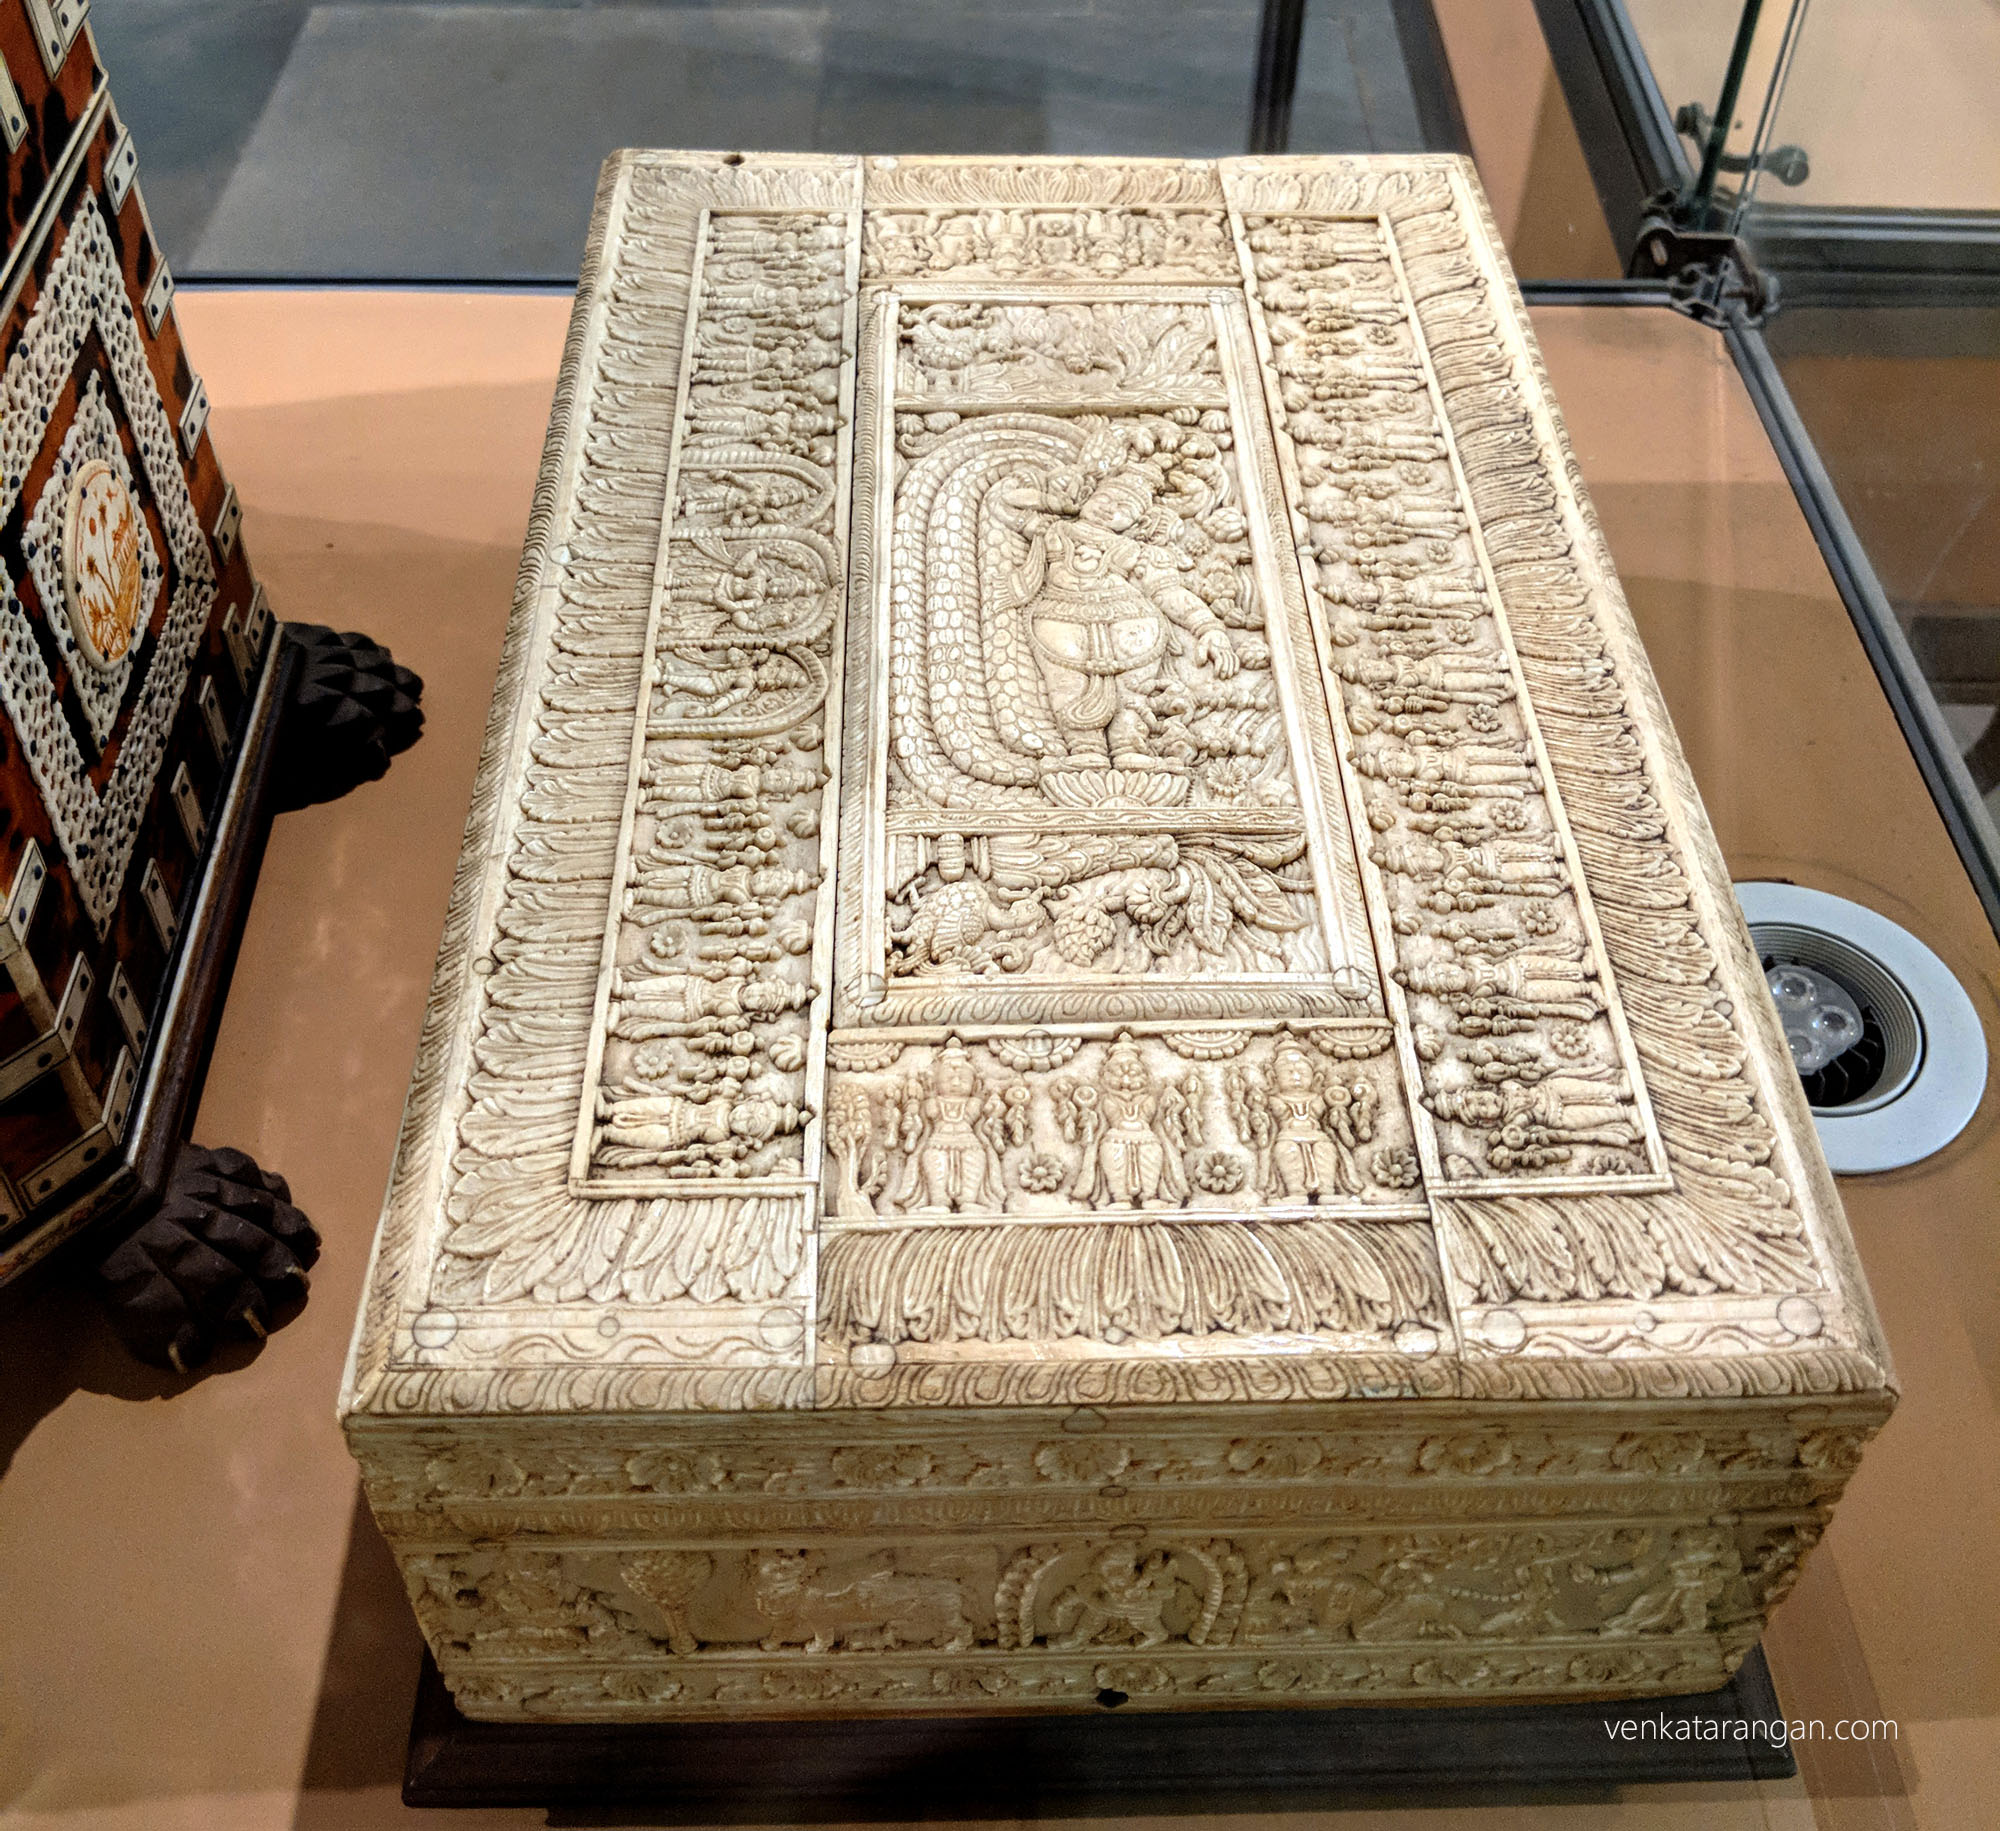 Intricate Ivory art, box showing various avatars of Lord Vishnu.